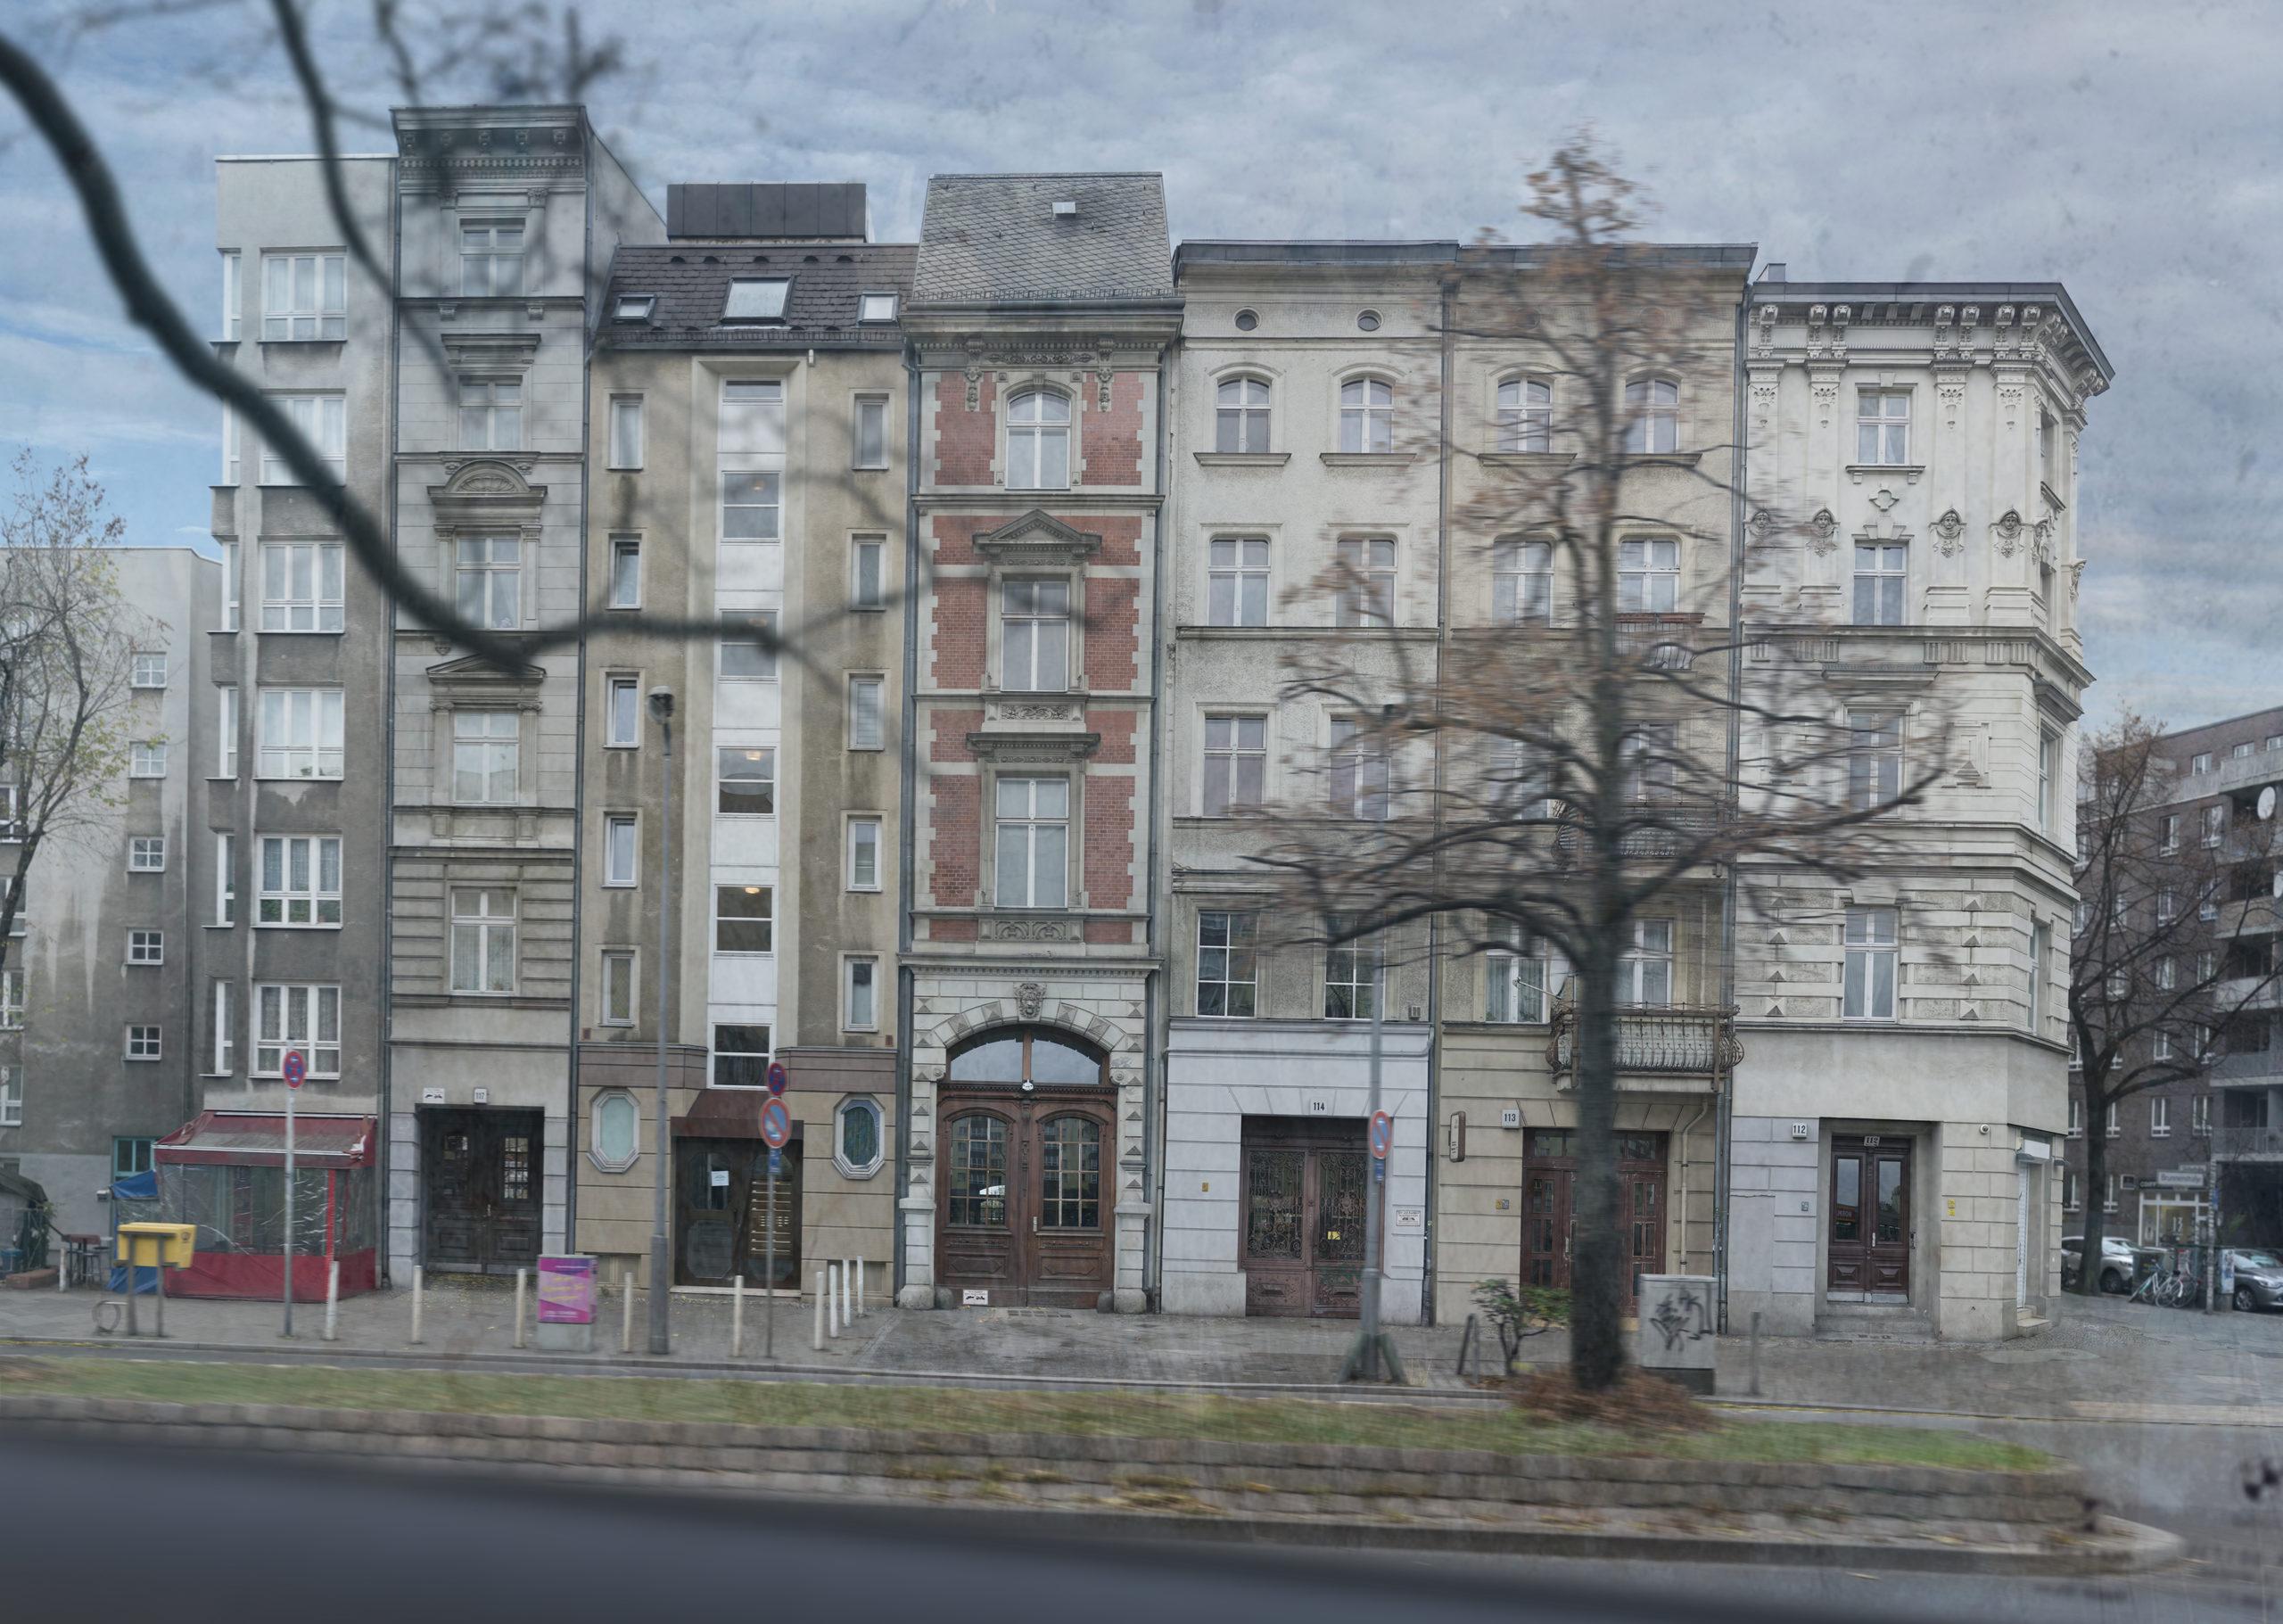 Dencity, Brunnenstrasse-Teil2, Berlin